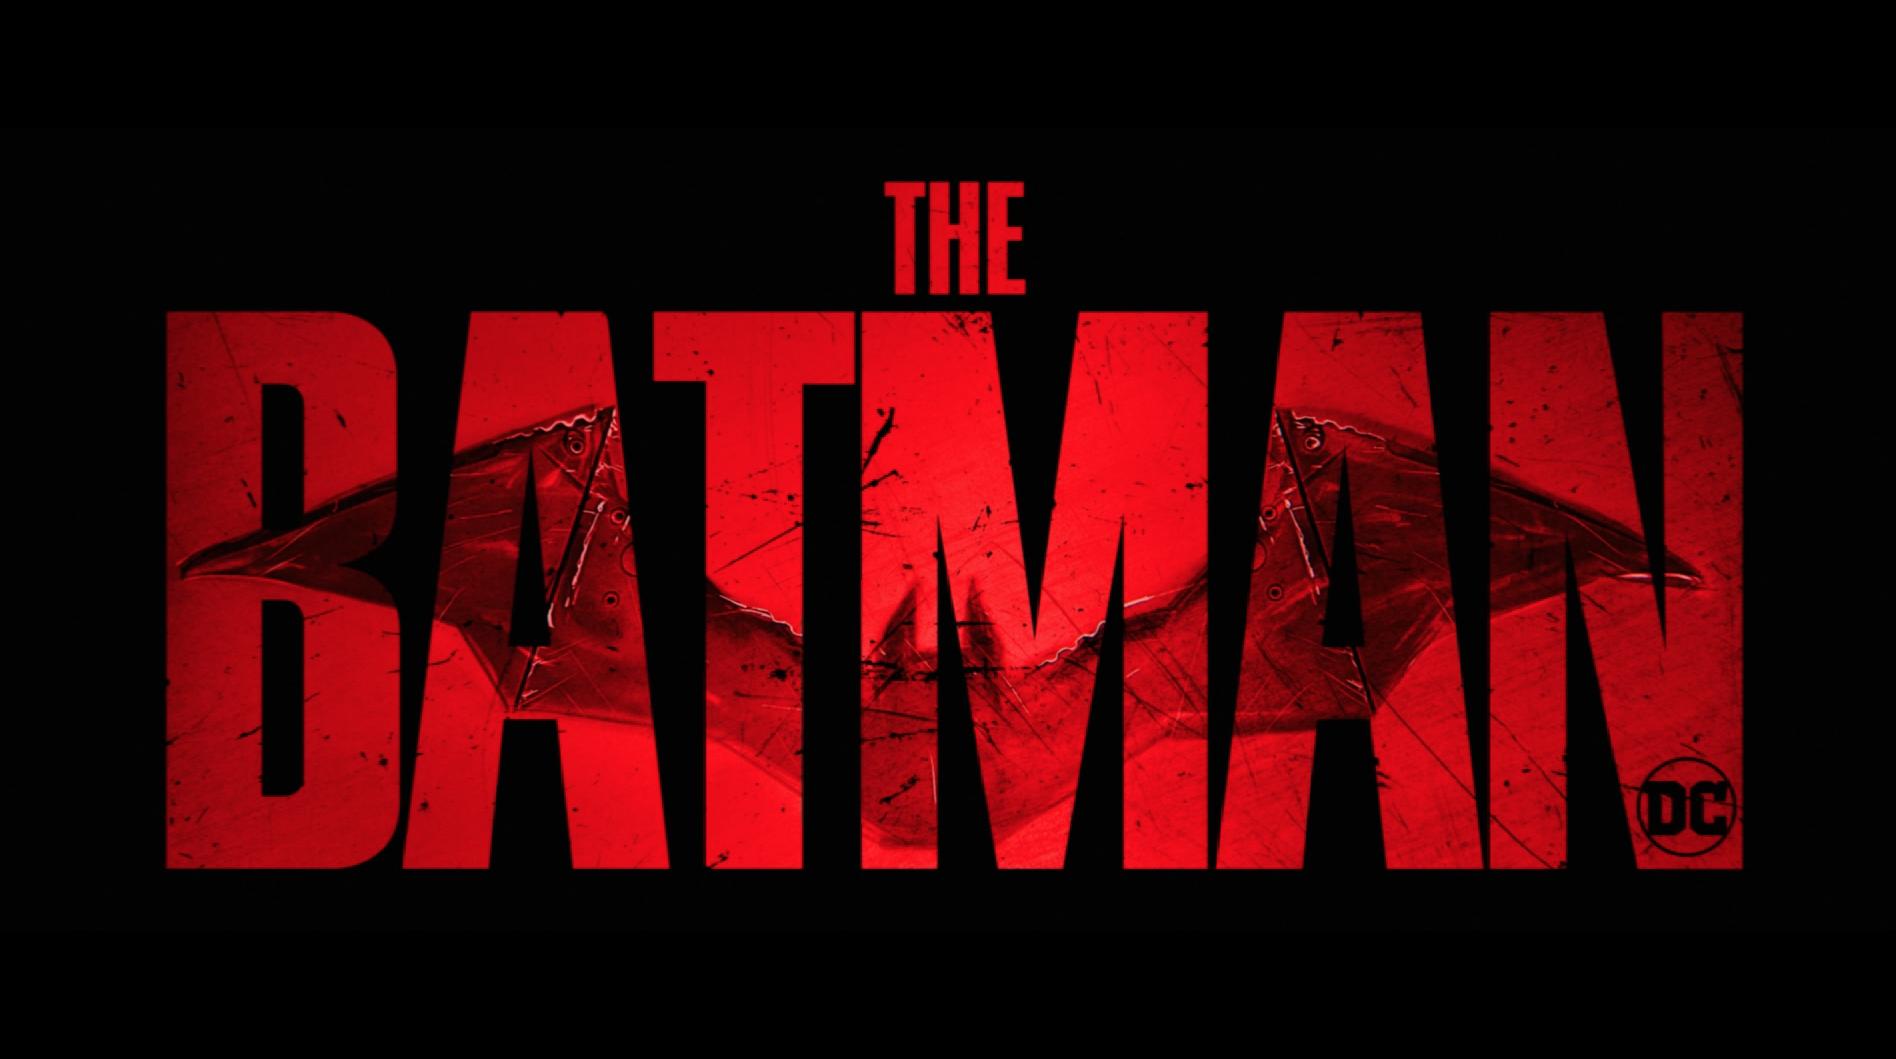 The new 'The Batman' logo from DC FanDome